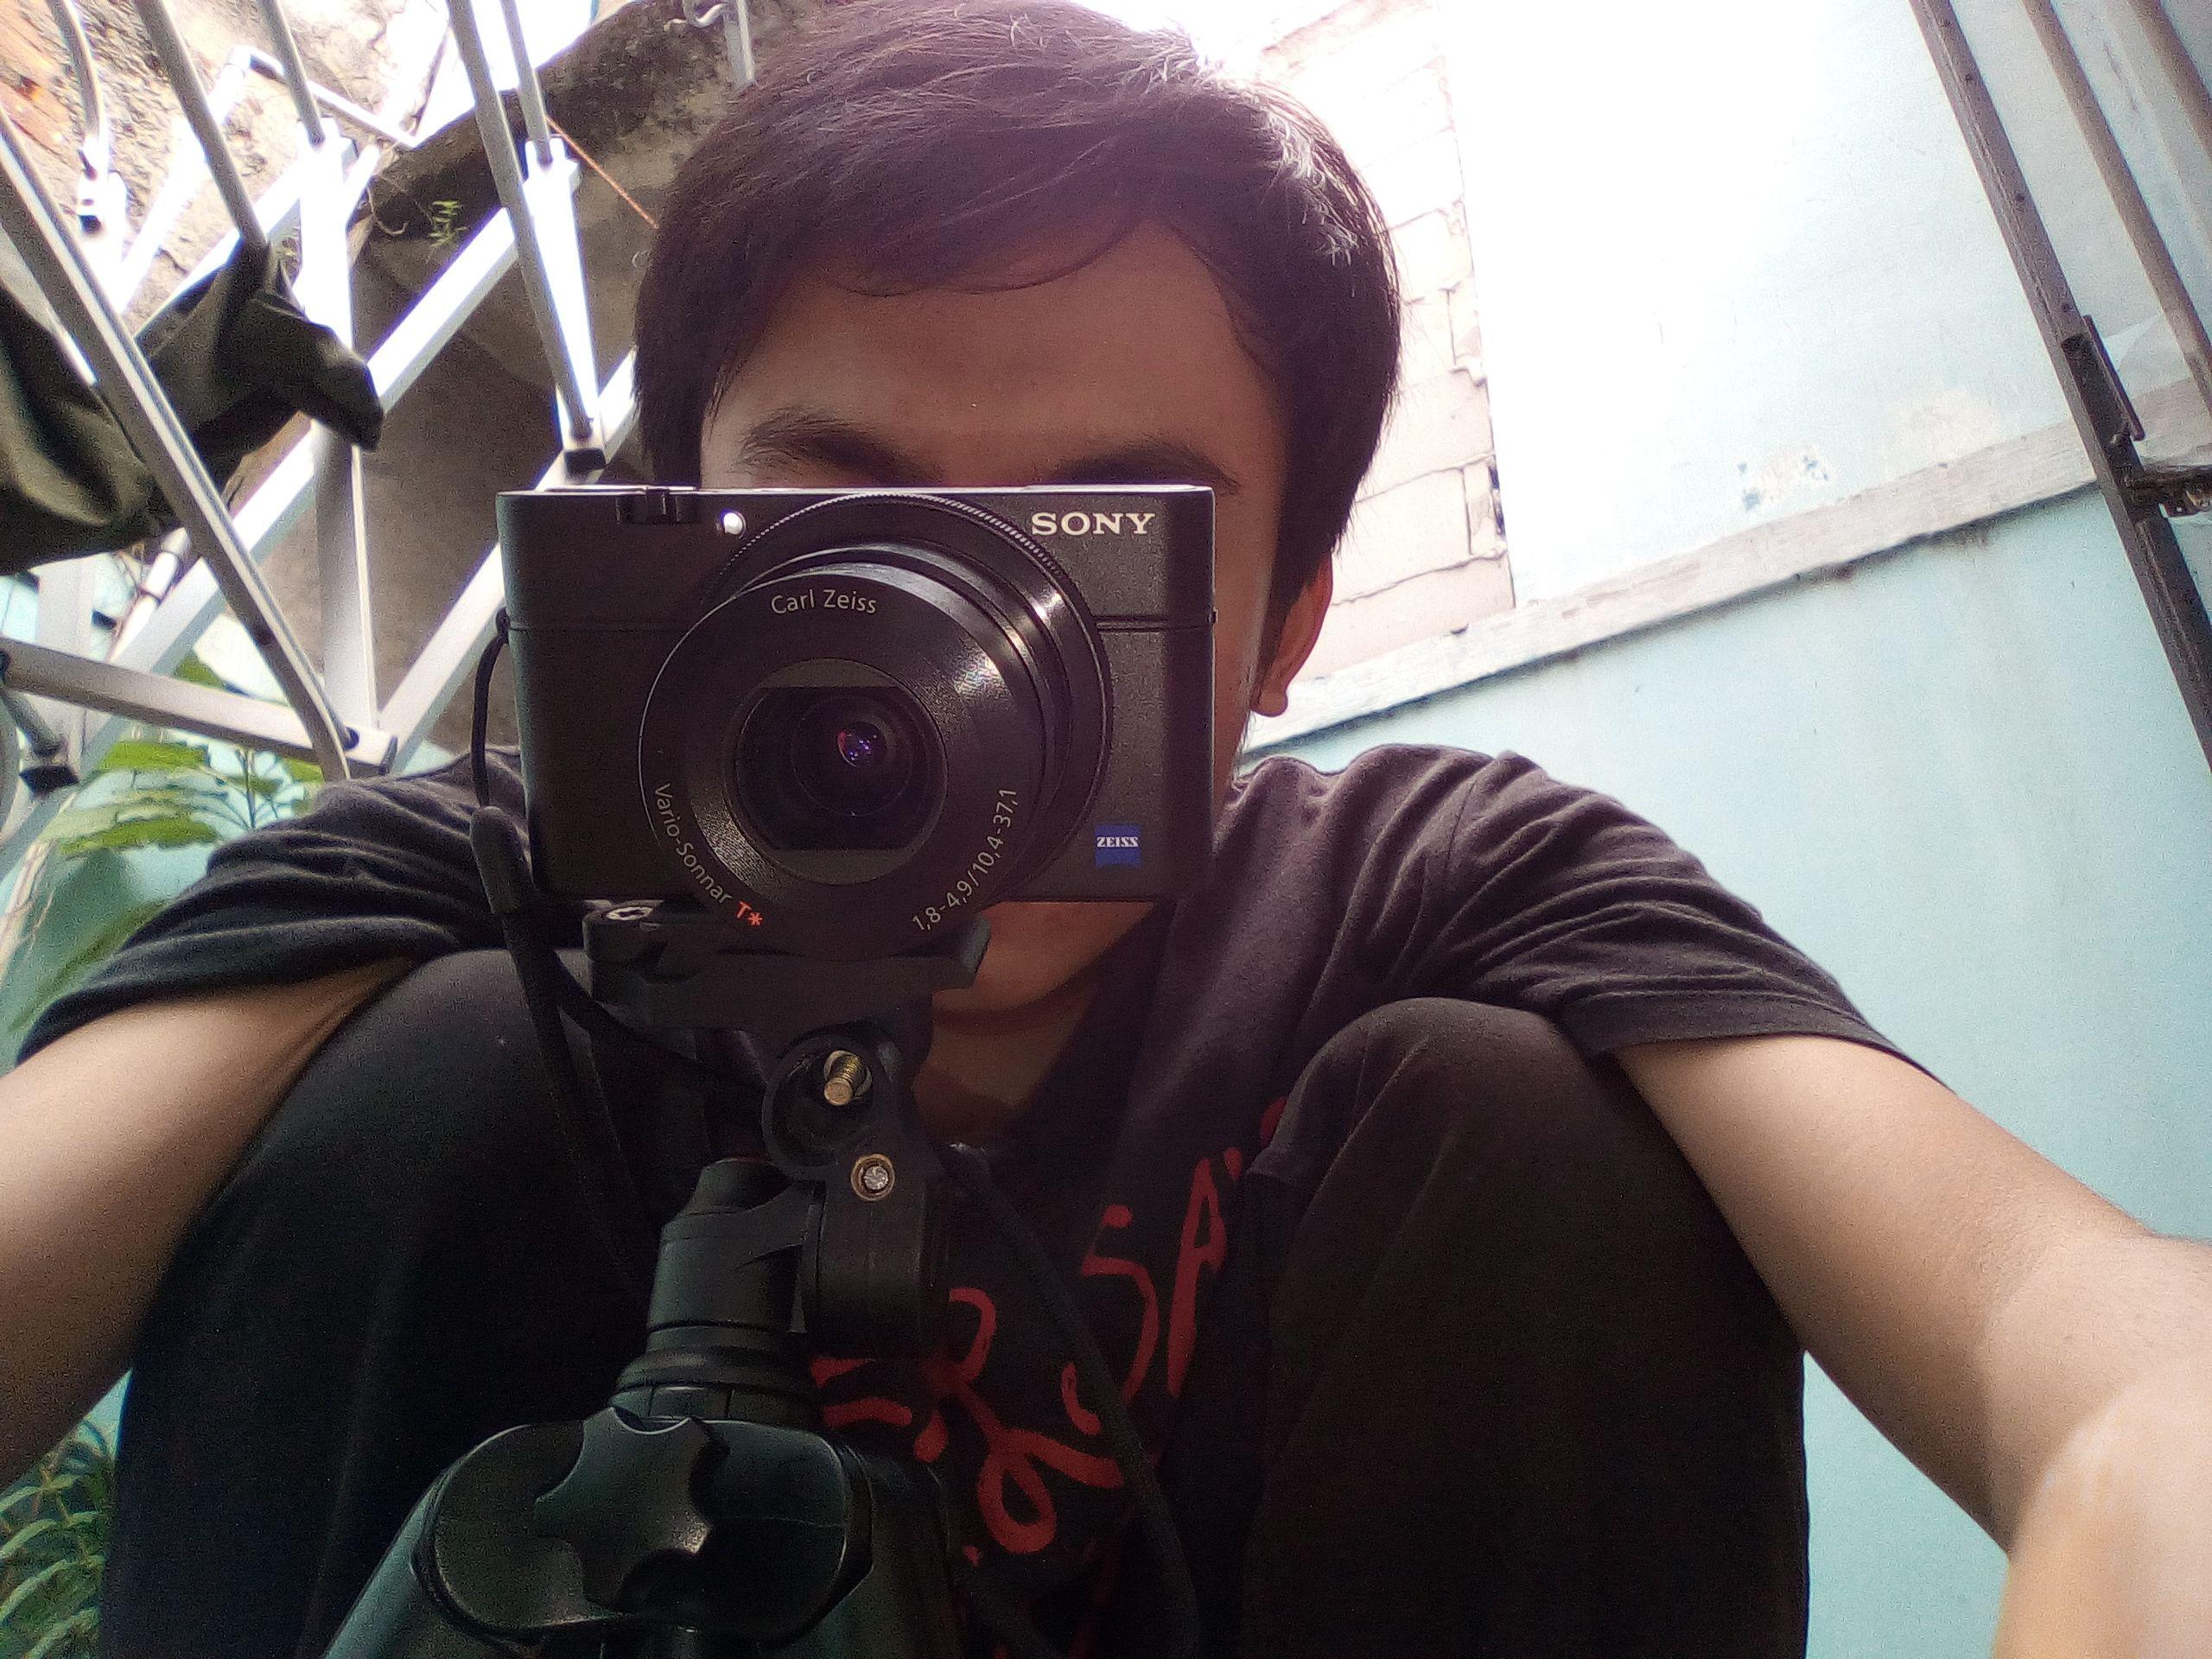 Wiko Robby Kamera Depan